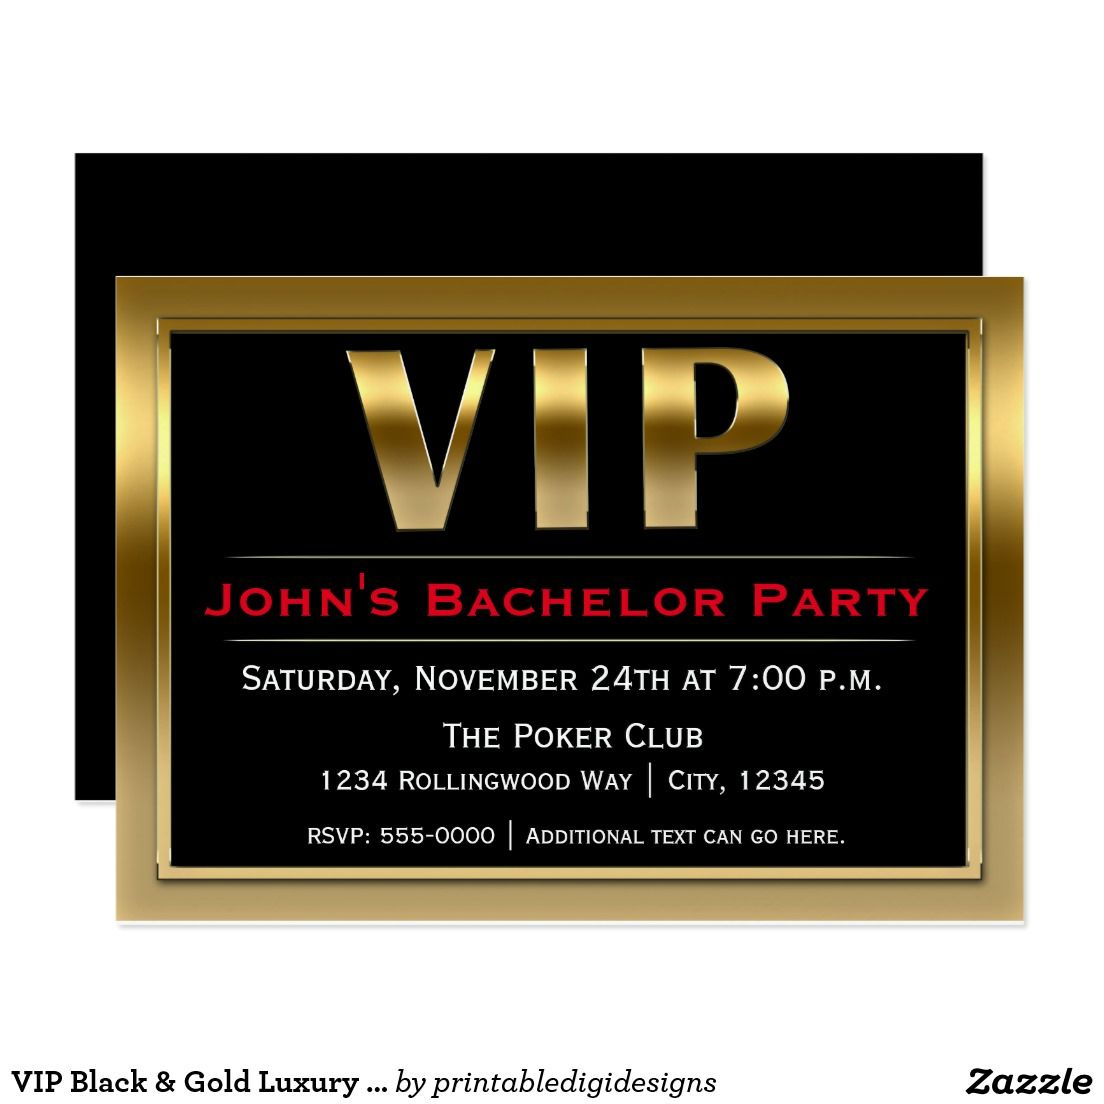 VIP Black Gold Luxury Party Invitation – Luxury Party Invitations